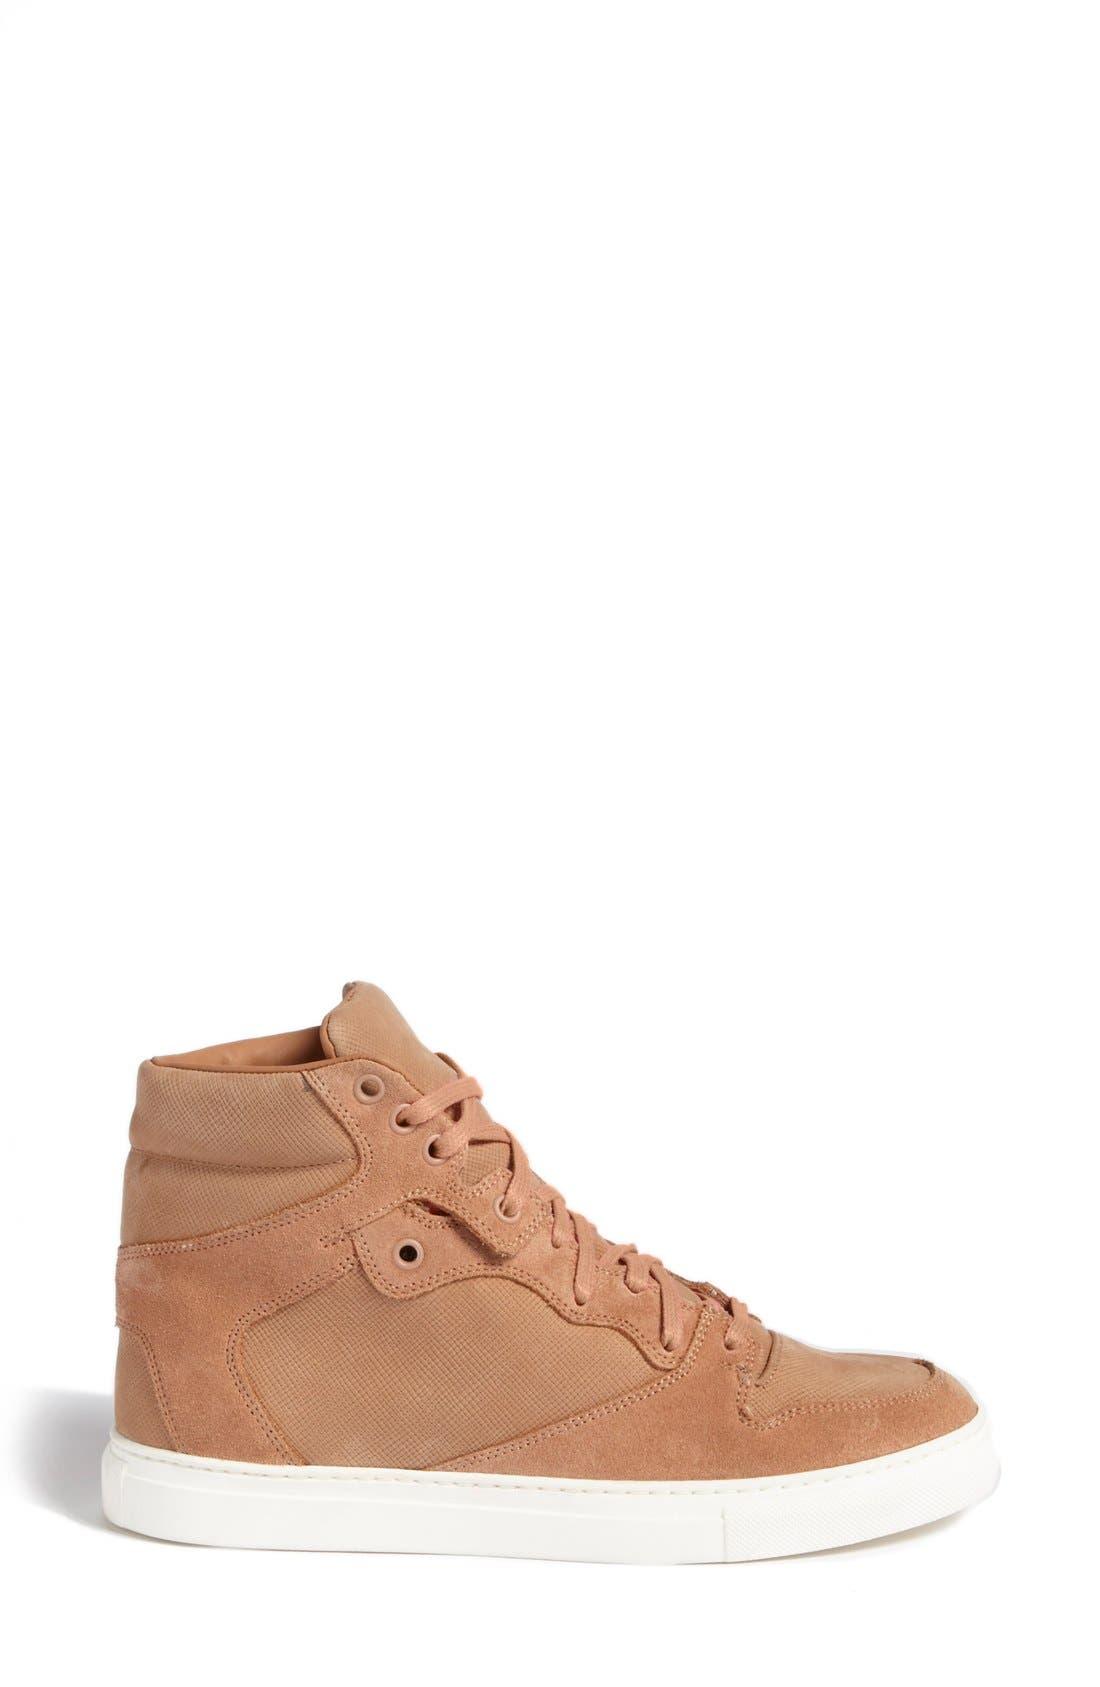 Alternate Image 2  - Balenciaga 'Trainer' High Top Sneaker (Women)